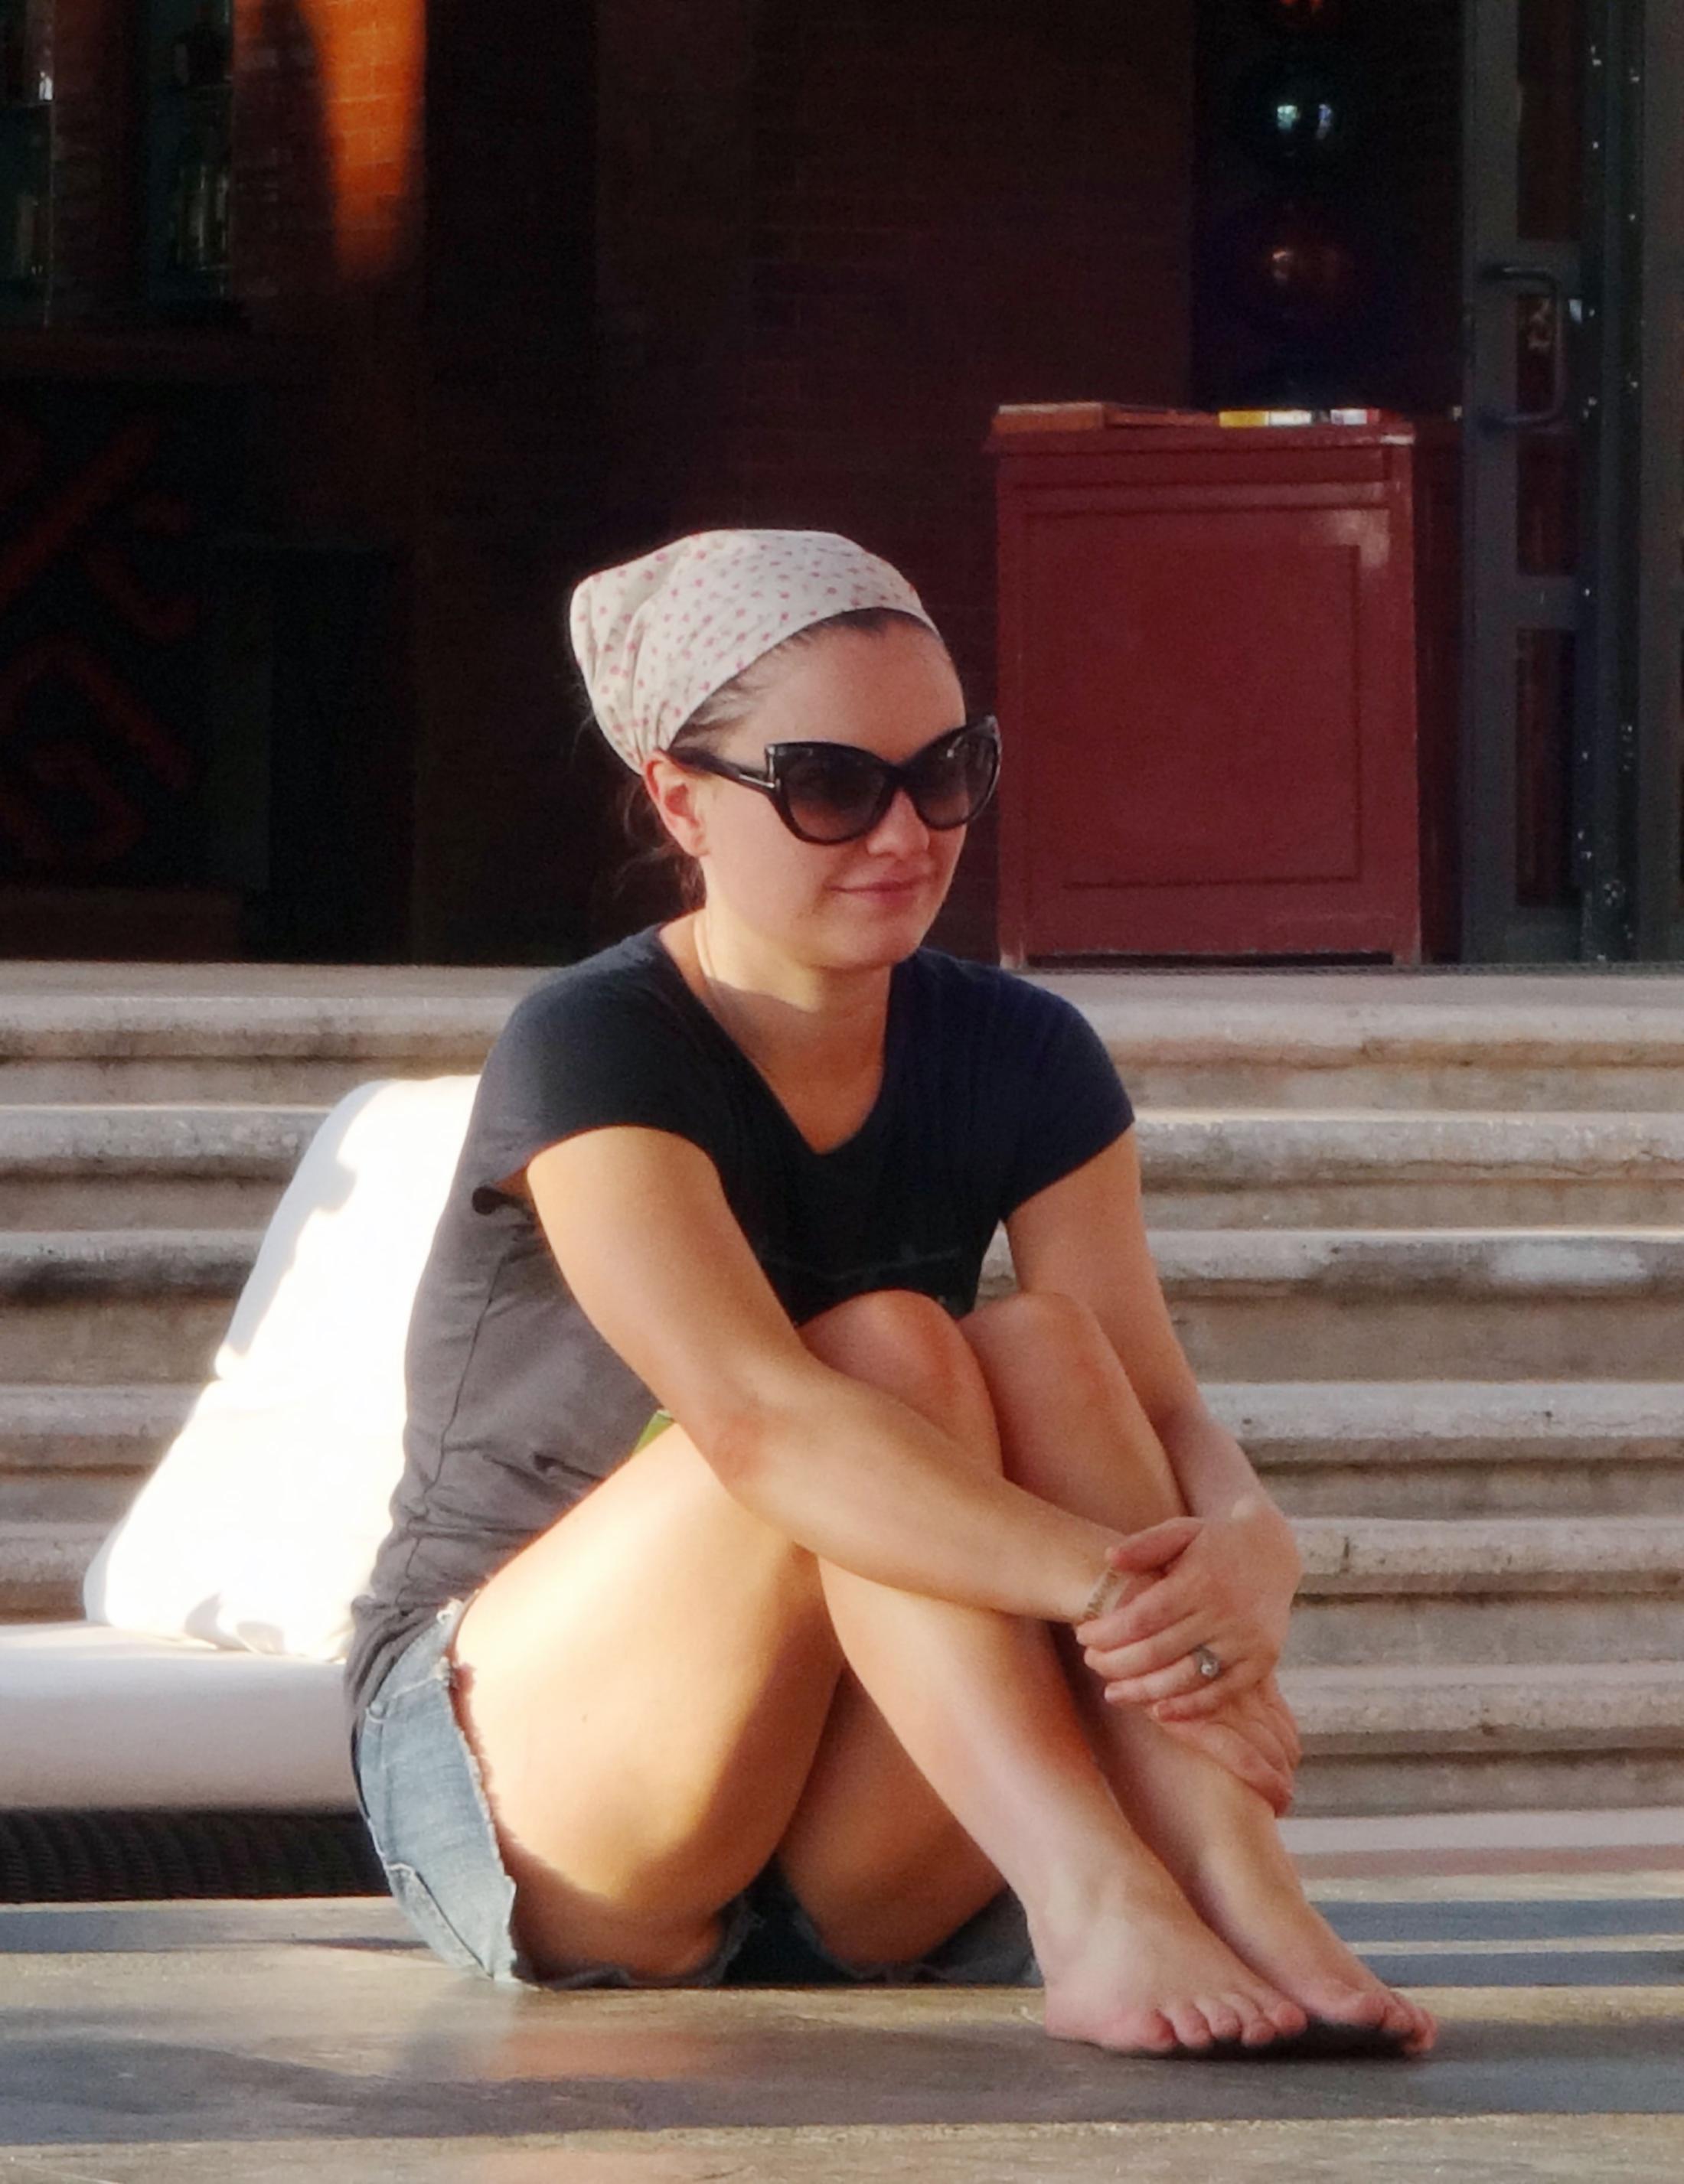 Nude Pics Of Anna Paquin 17